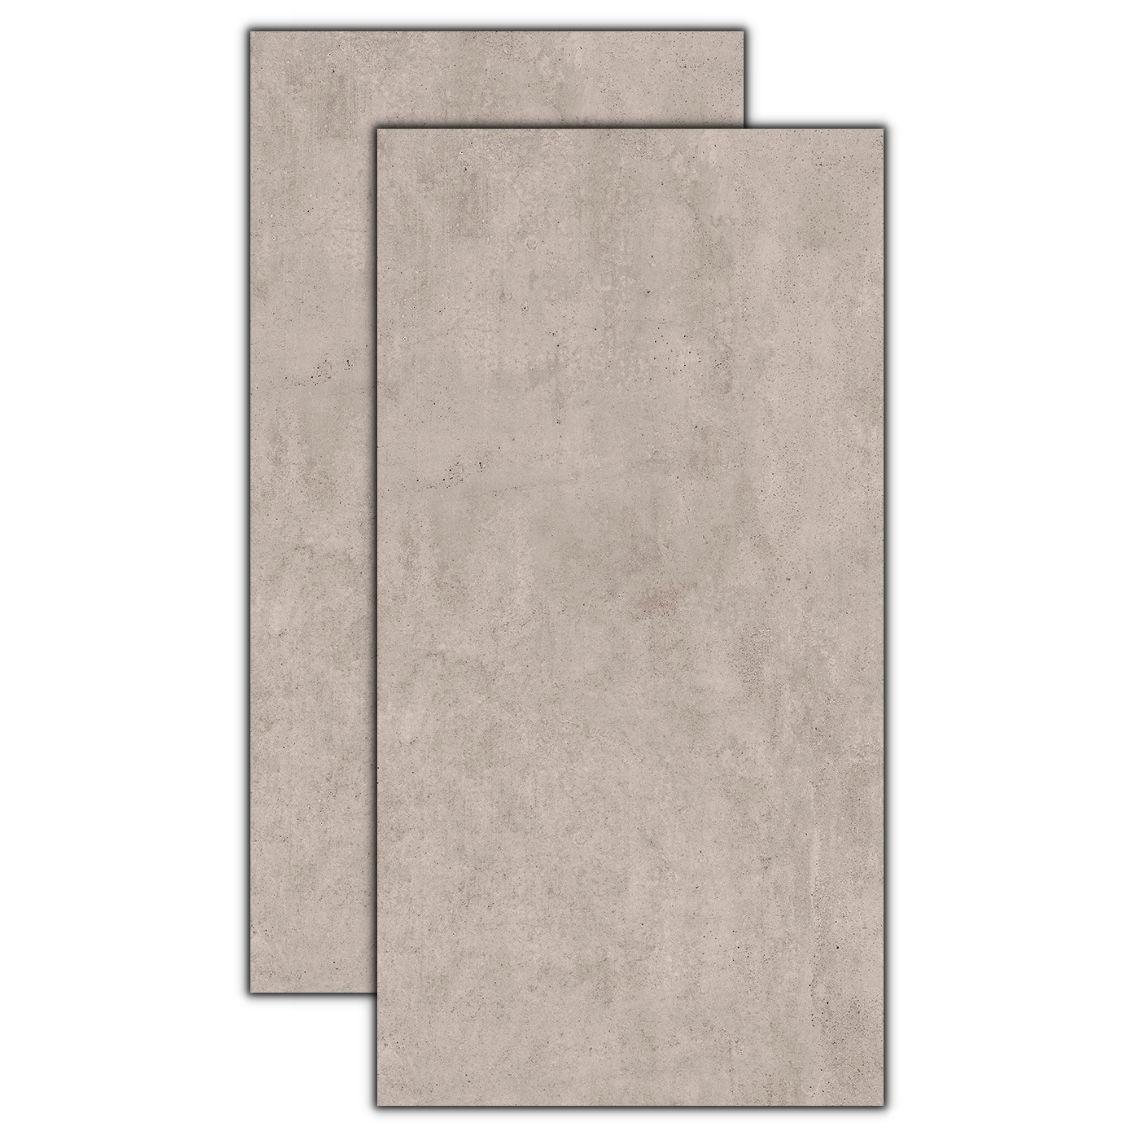 Toronto Cement In 63x120 cm <br /><b>R$ 81,90 M² </b><br />Cx 2,27 M² <b> R$ 185,91</b>